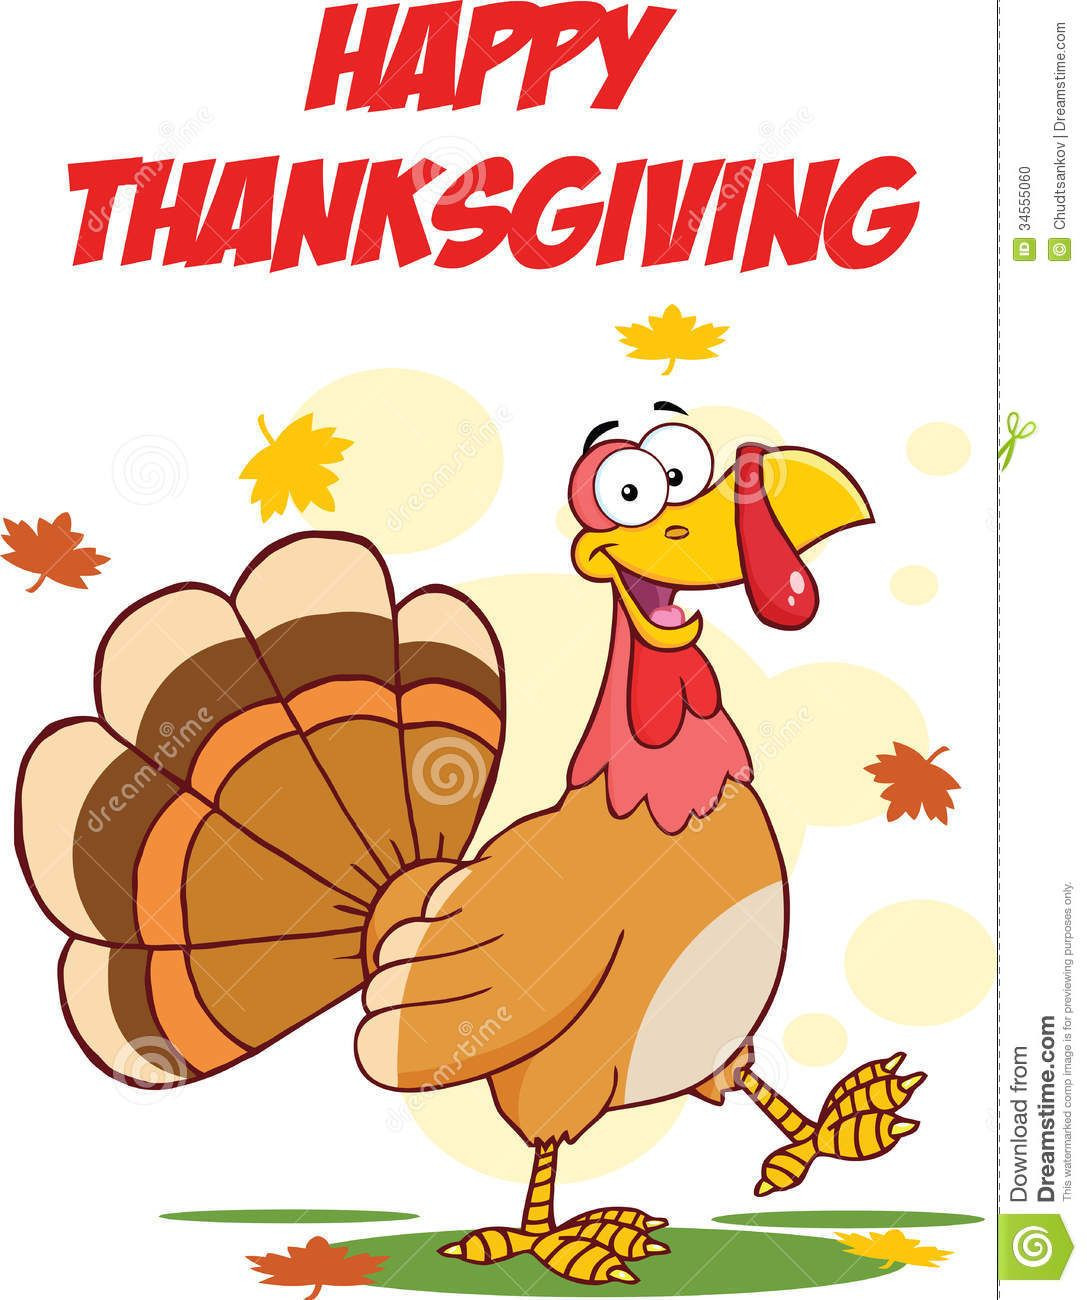 Thanksgiving Turkey Cartoon Images  Cartoon Thanksgiving Cartoon Thanksgiving